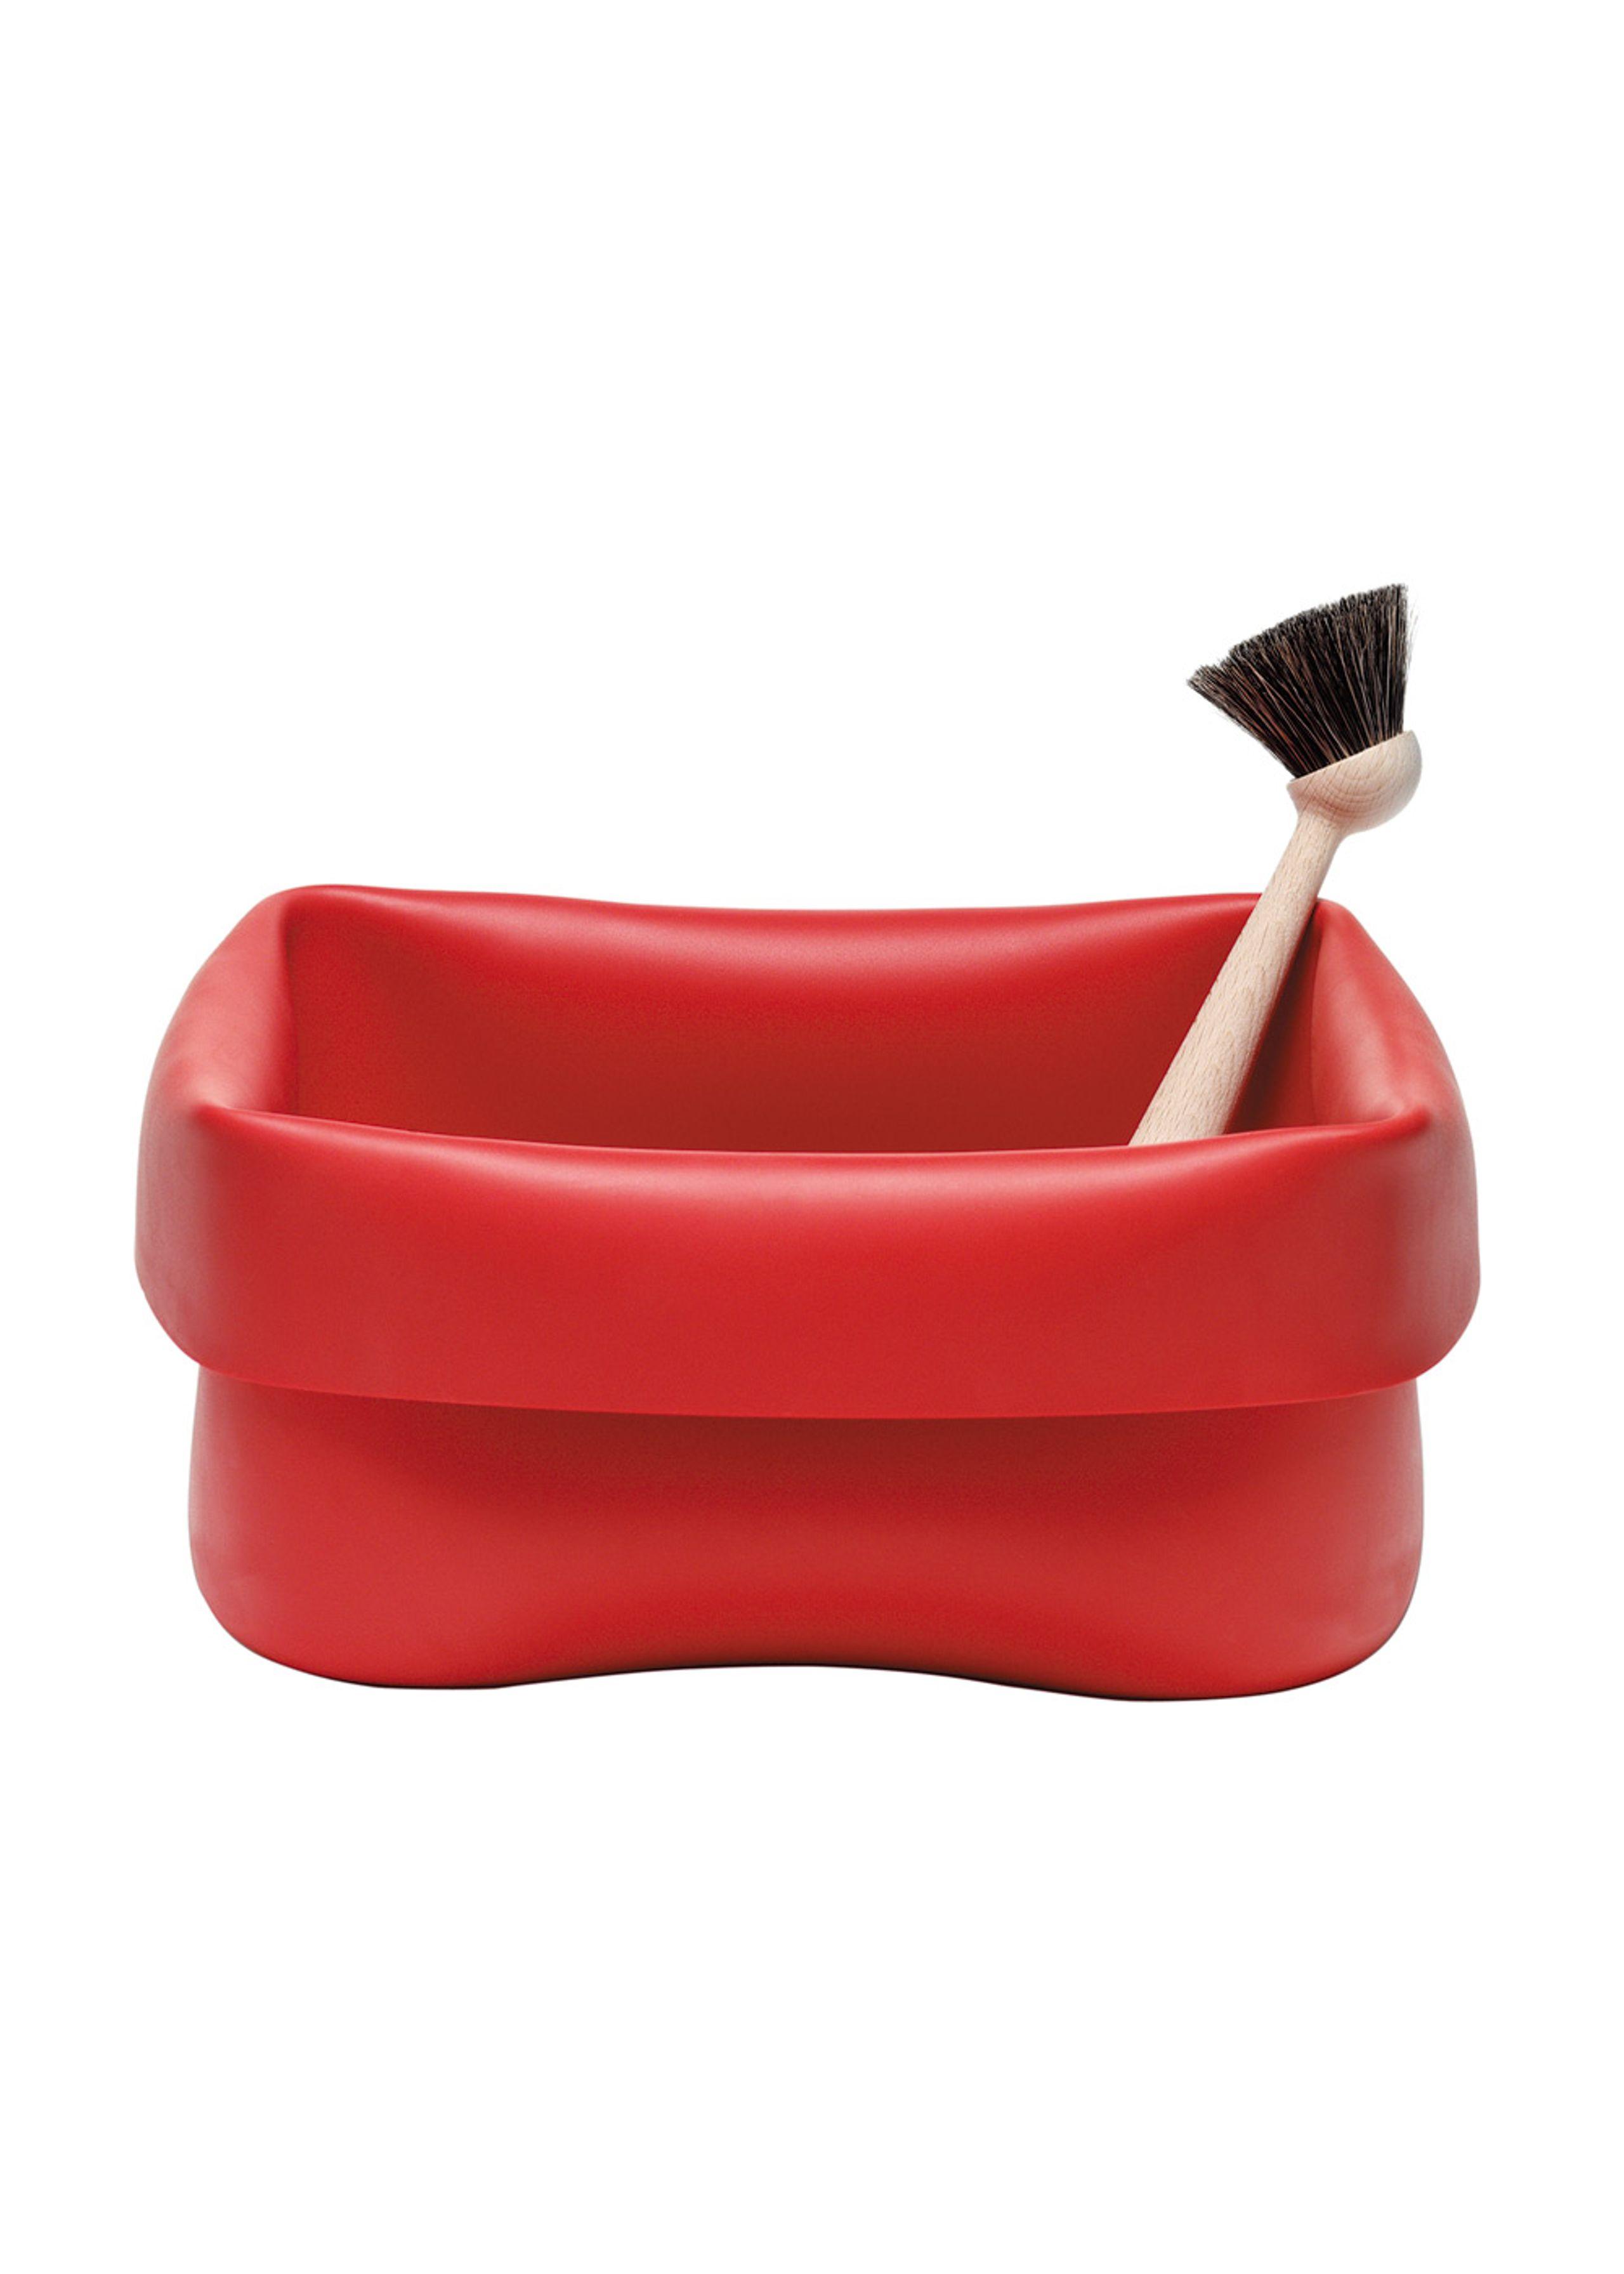 Washing up bowl & brush